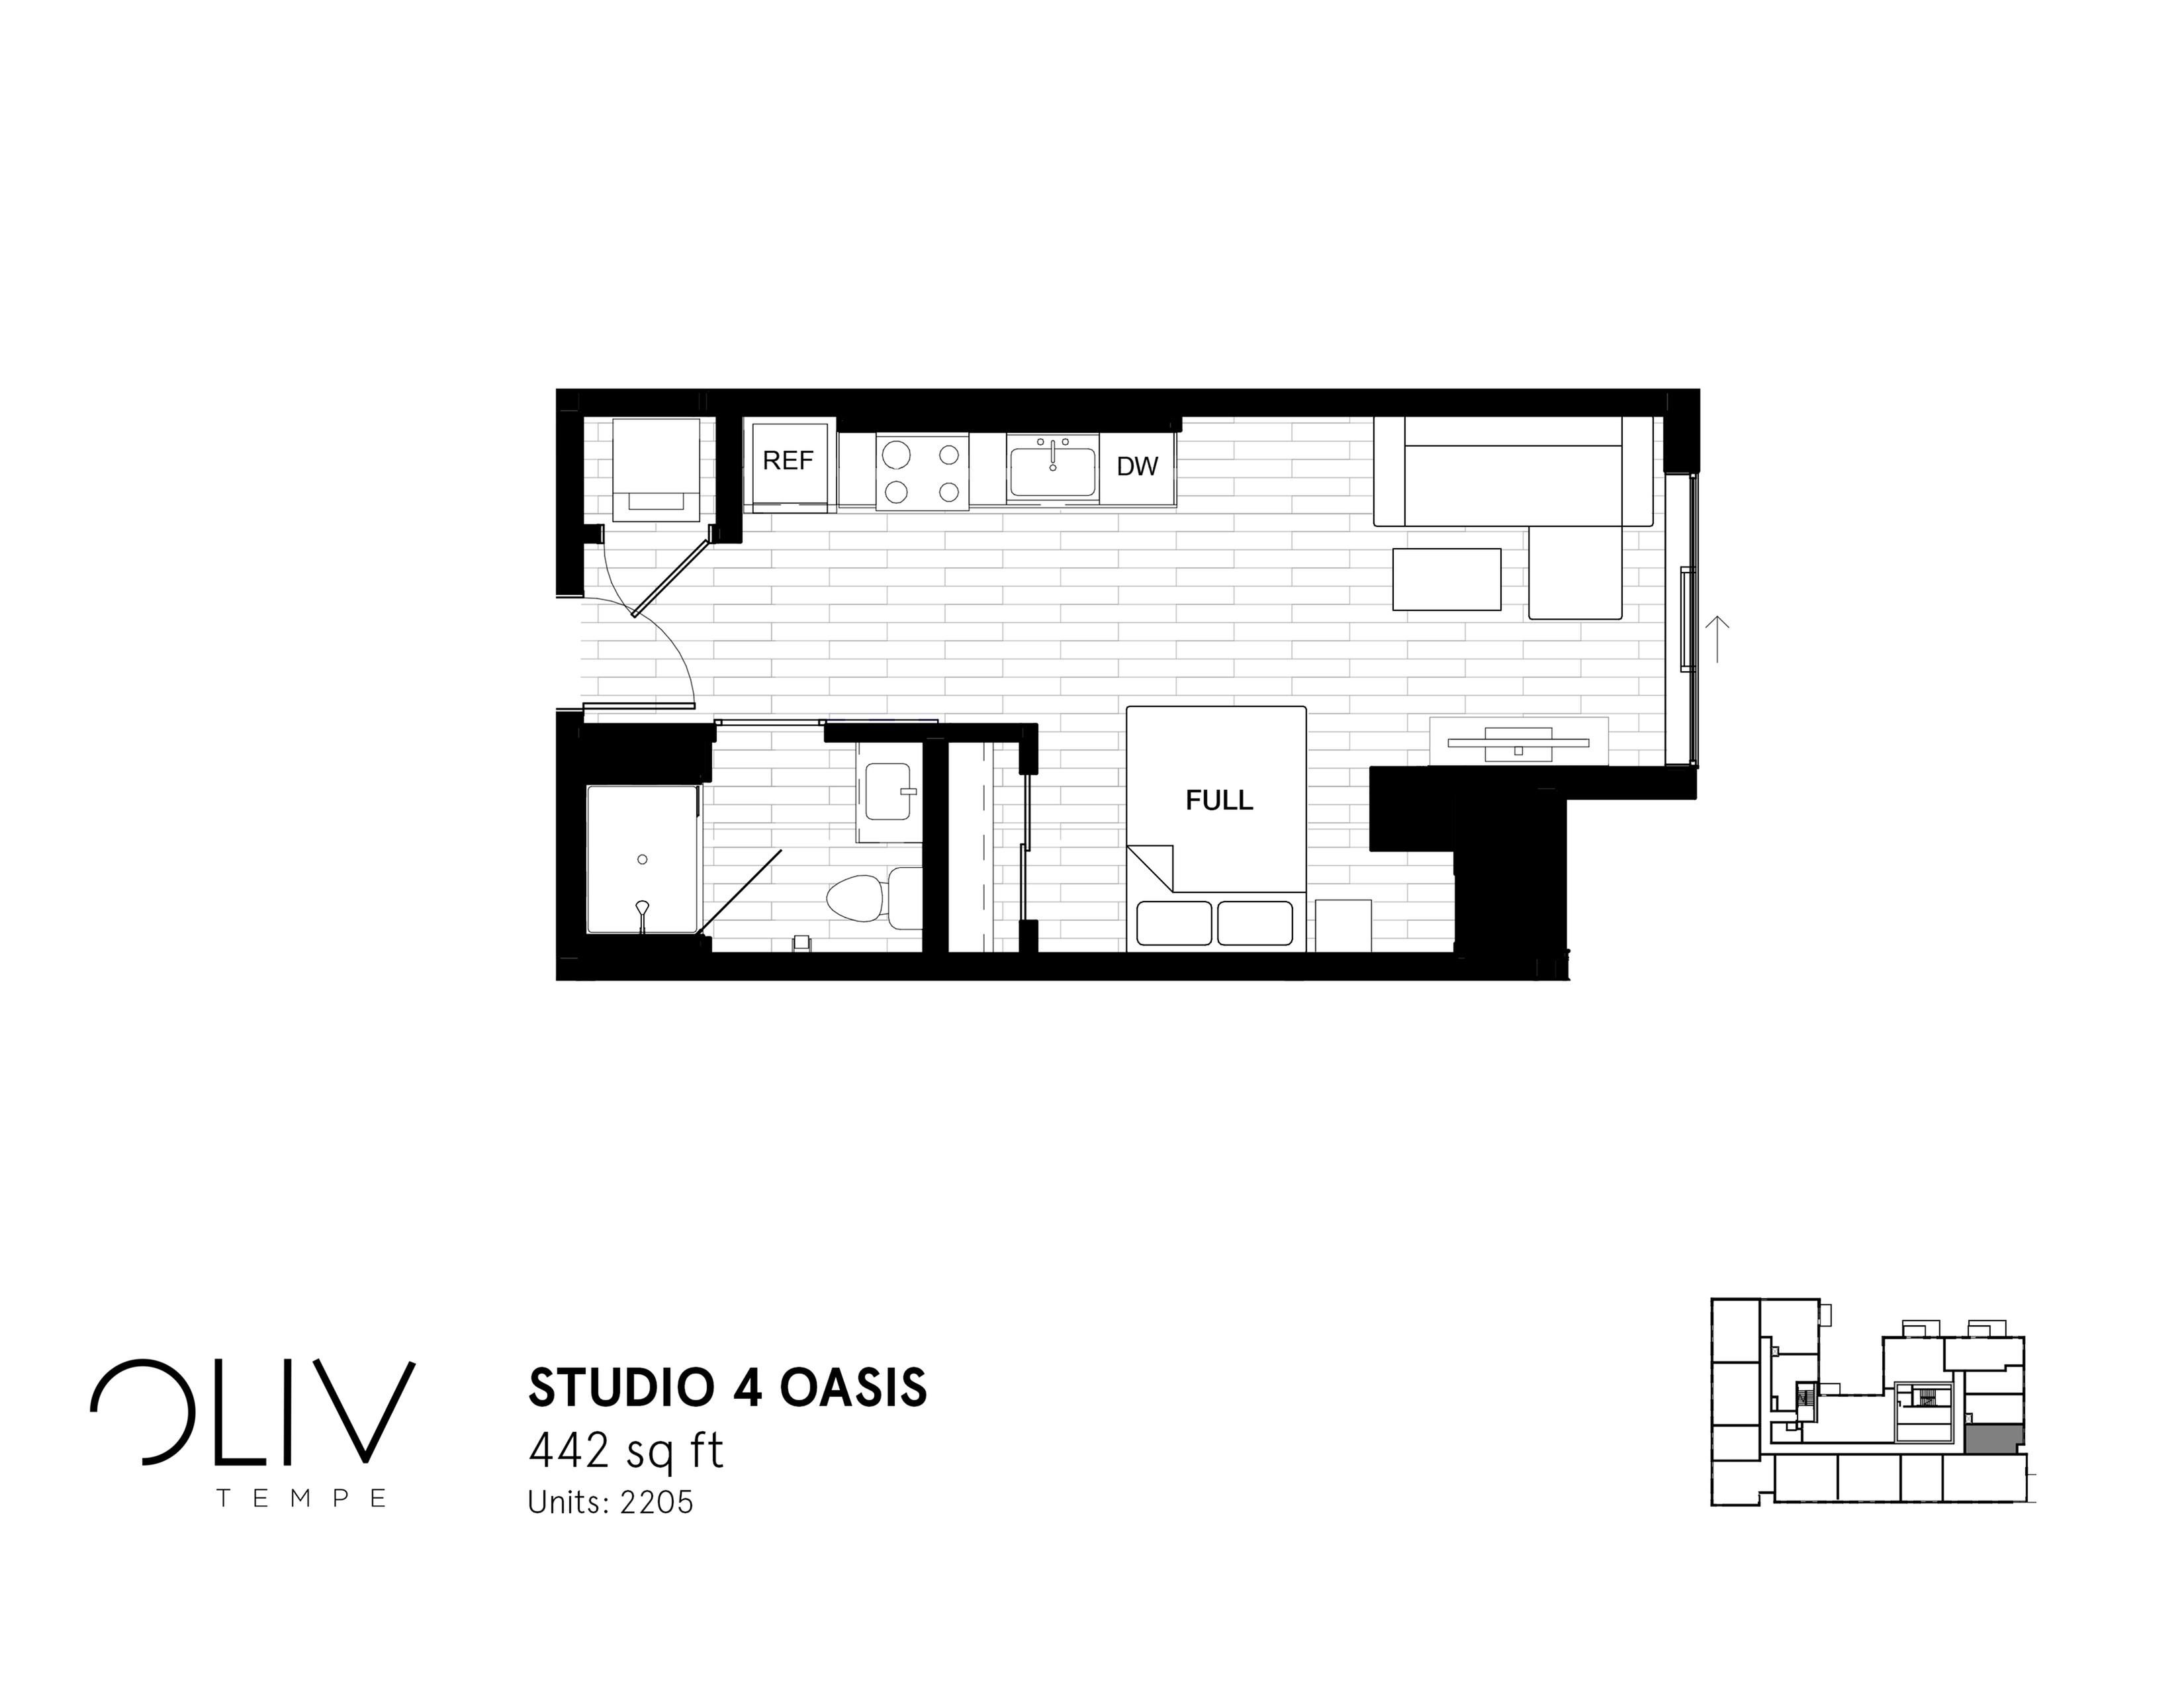 Studio 4 Oasis